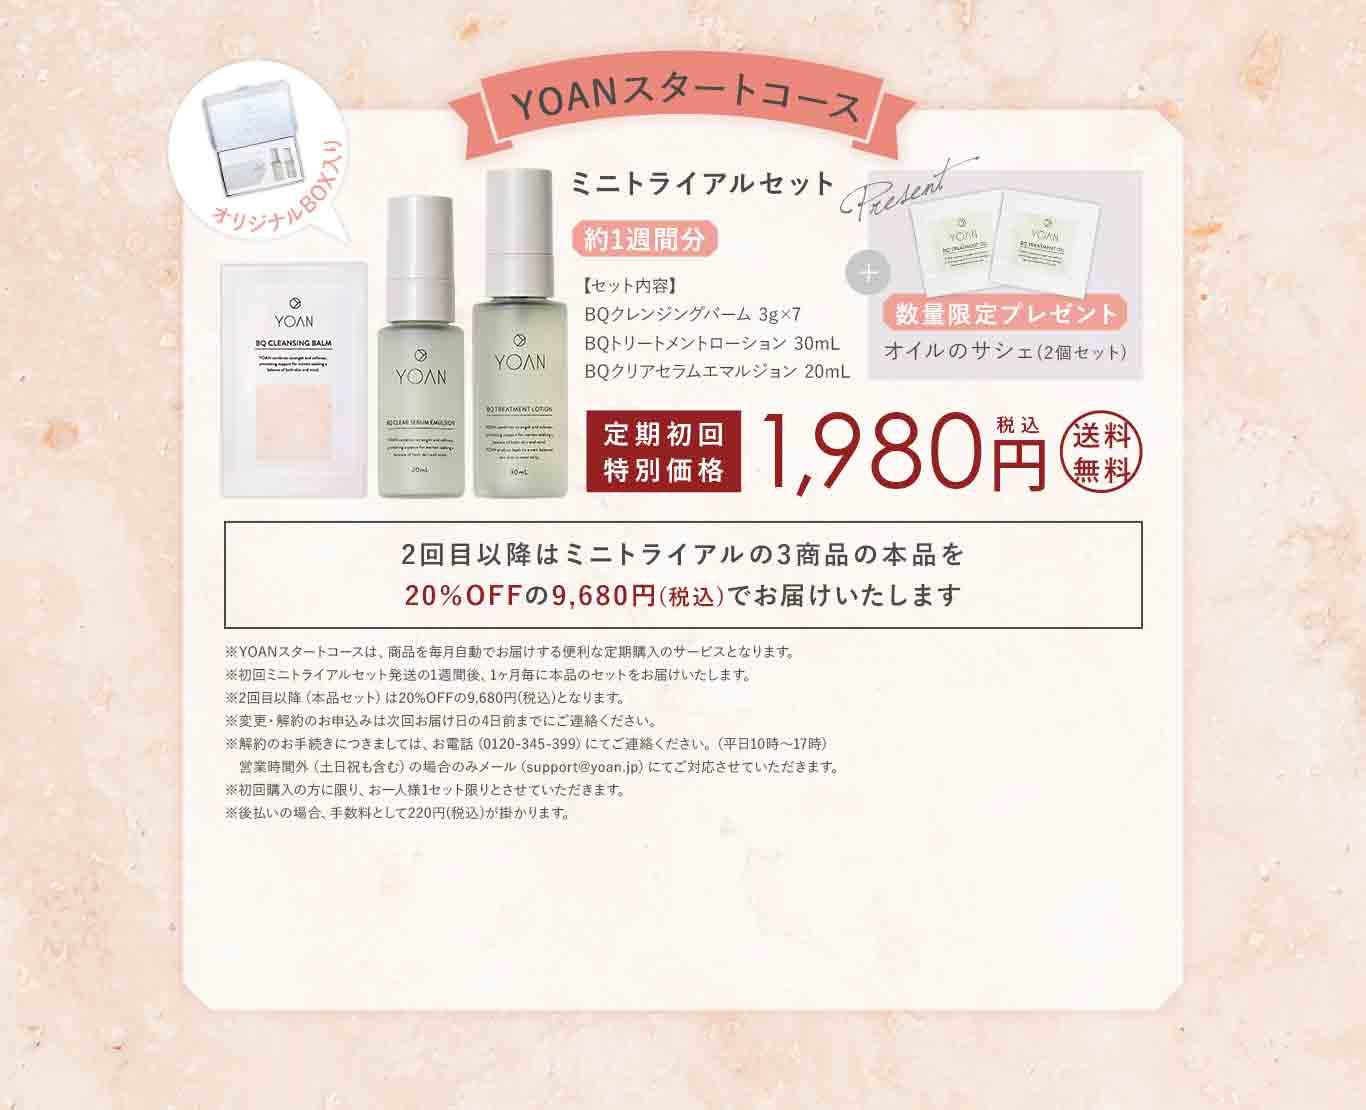 YOANスタートコース ミニトライアルセット 定期初回特別価格 1,980円(税込) 送料無料